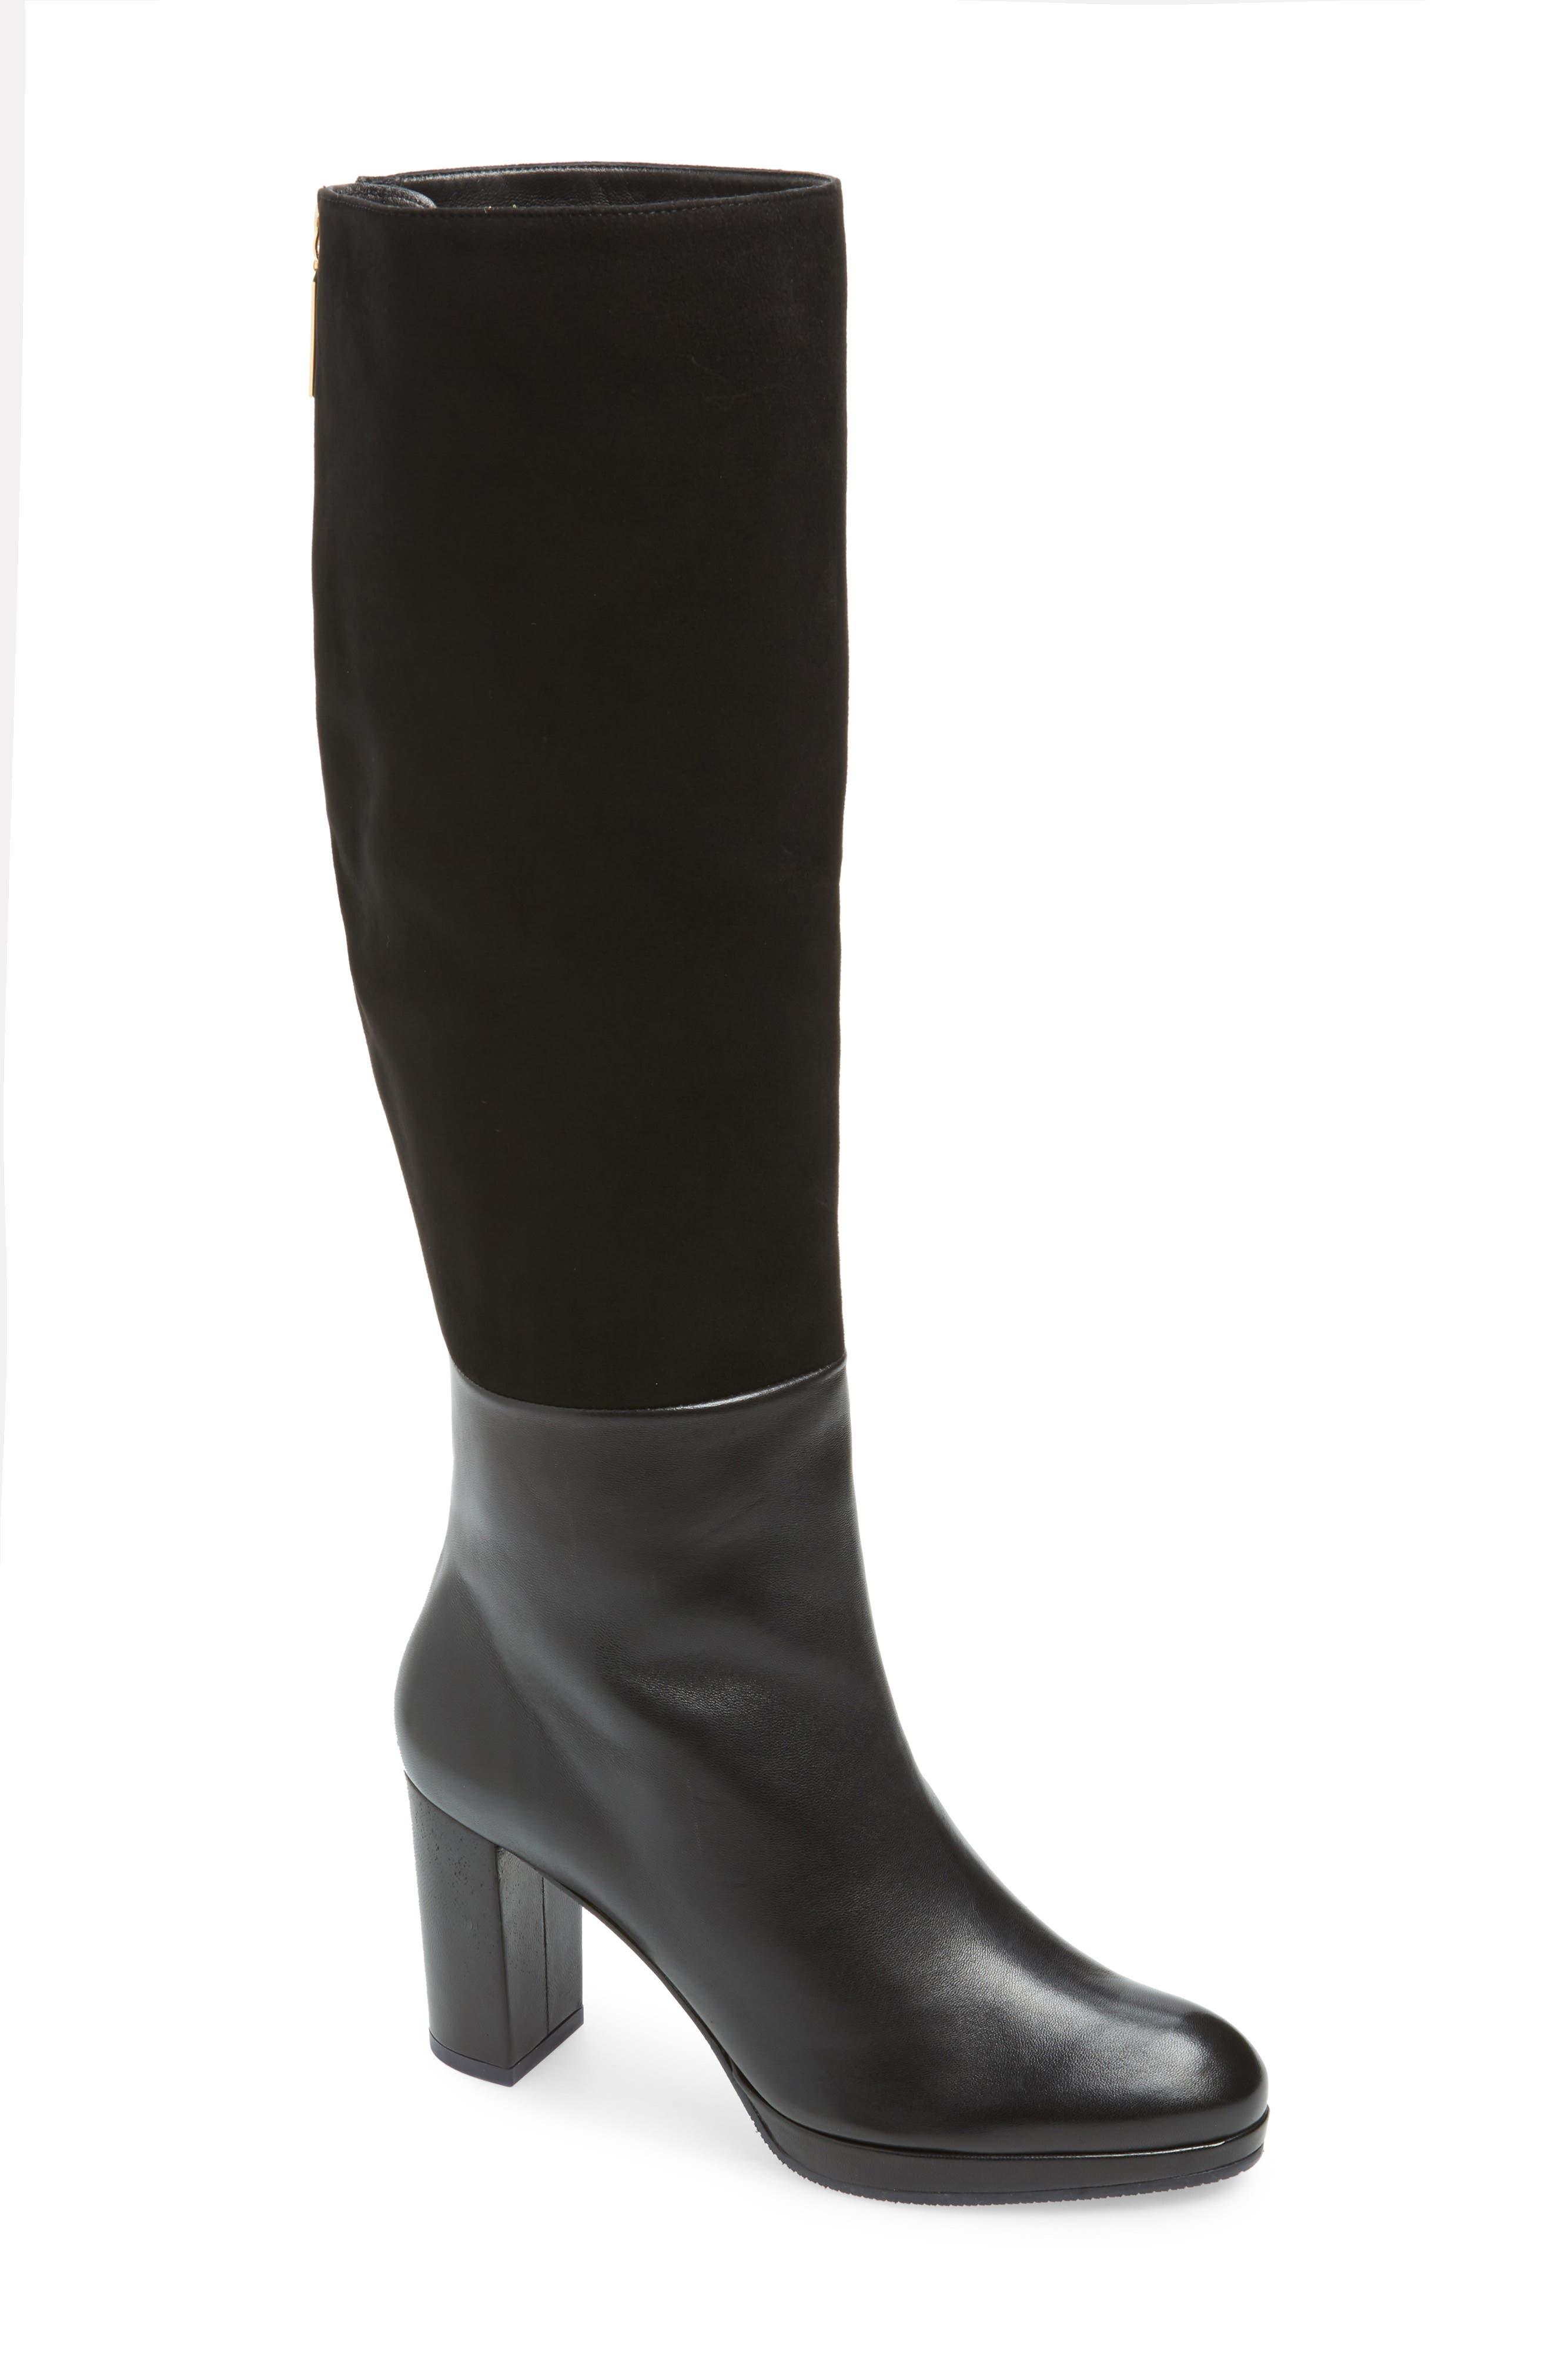 Stuart Weitzman Marcella Knee High Boot- Black